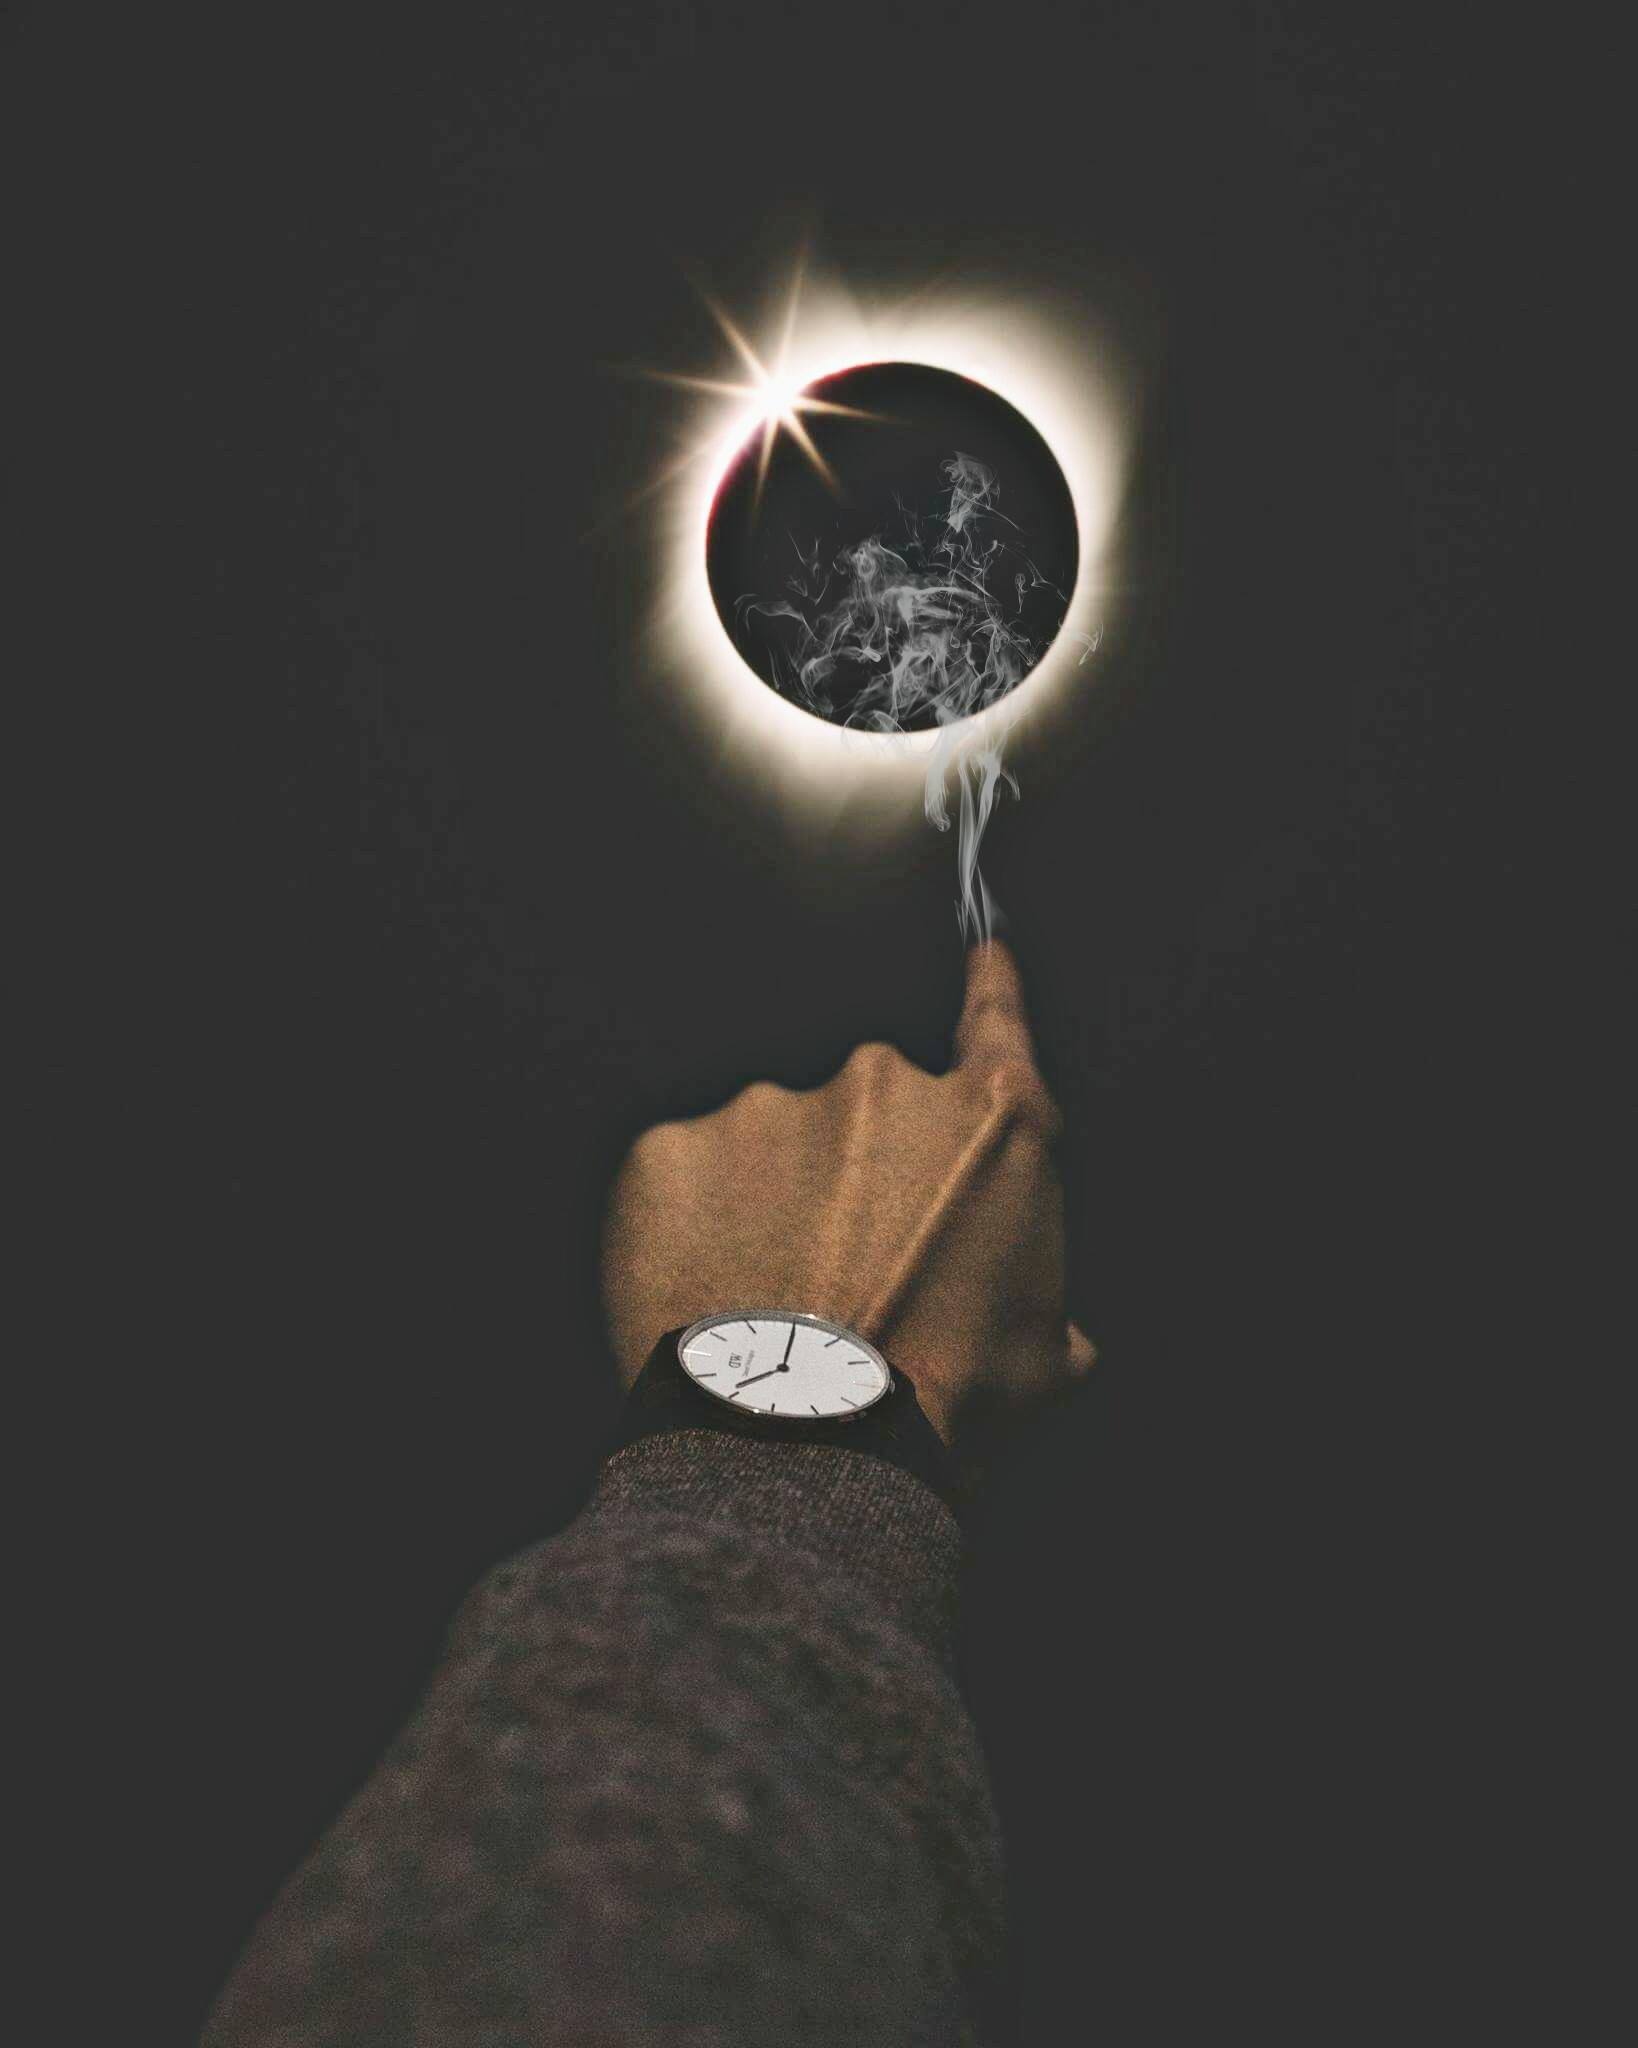 #eclipse2017 #solareclipse #magic # #retro #remixit